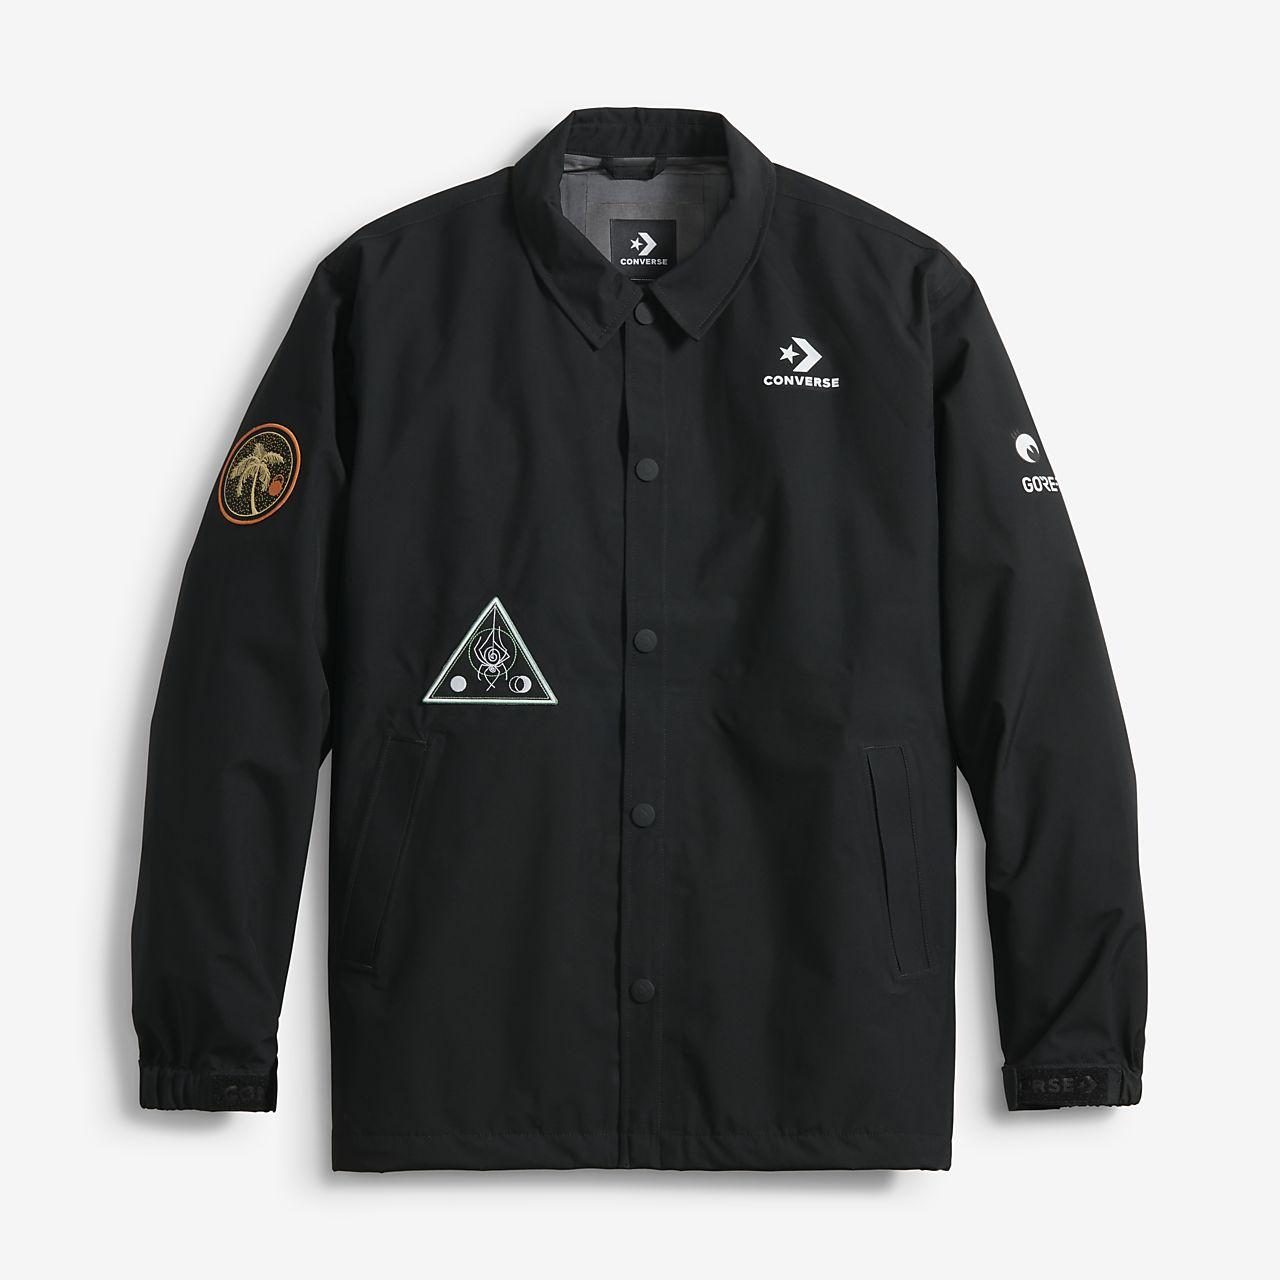 Converse x Dr. Woo GORE-TEX® Unisex Jacket